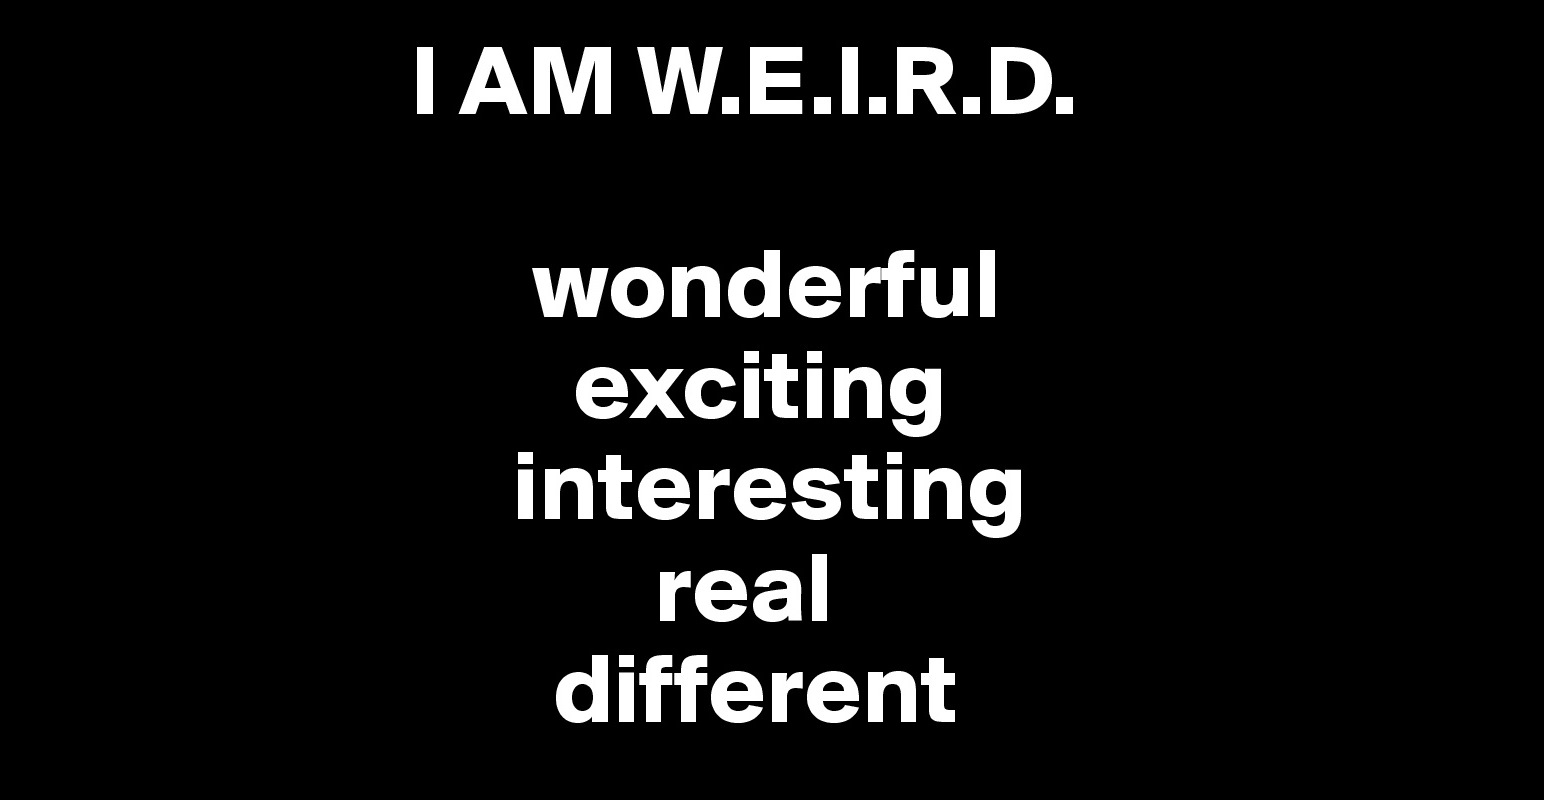 I AM W.E.I.R.D. wonderful exciting interesting real ...